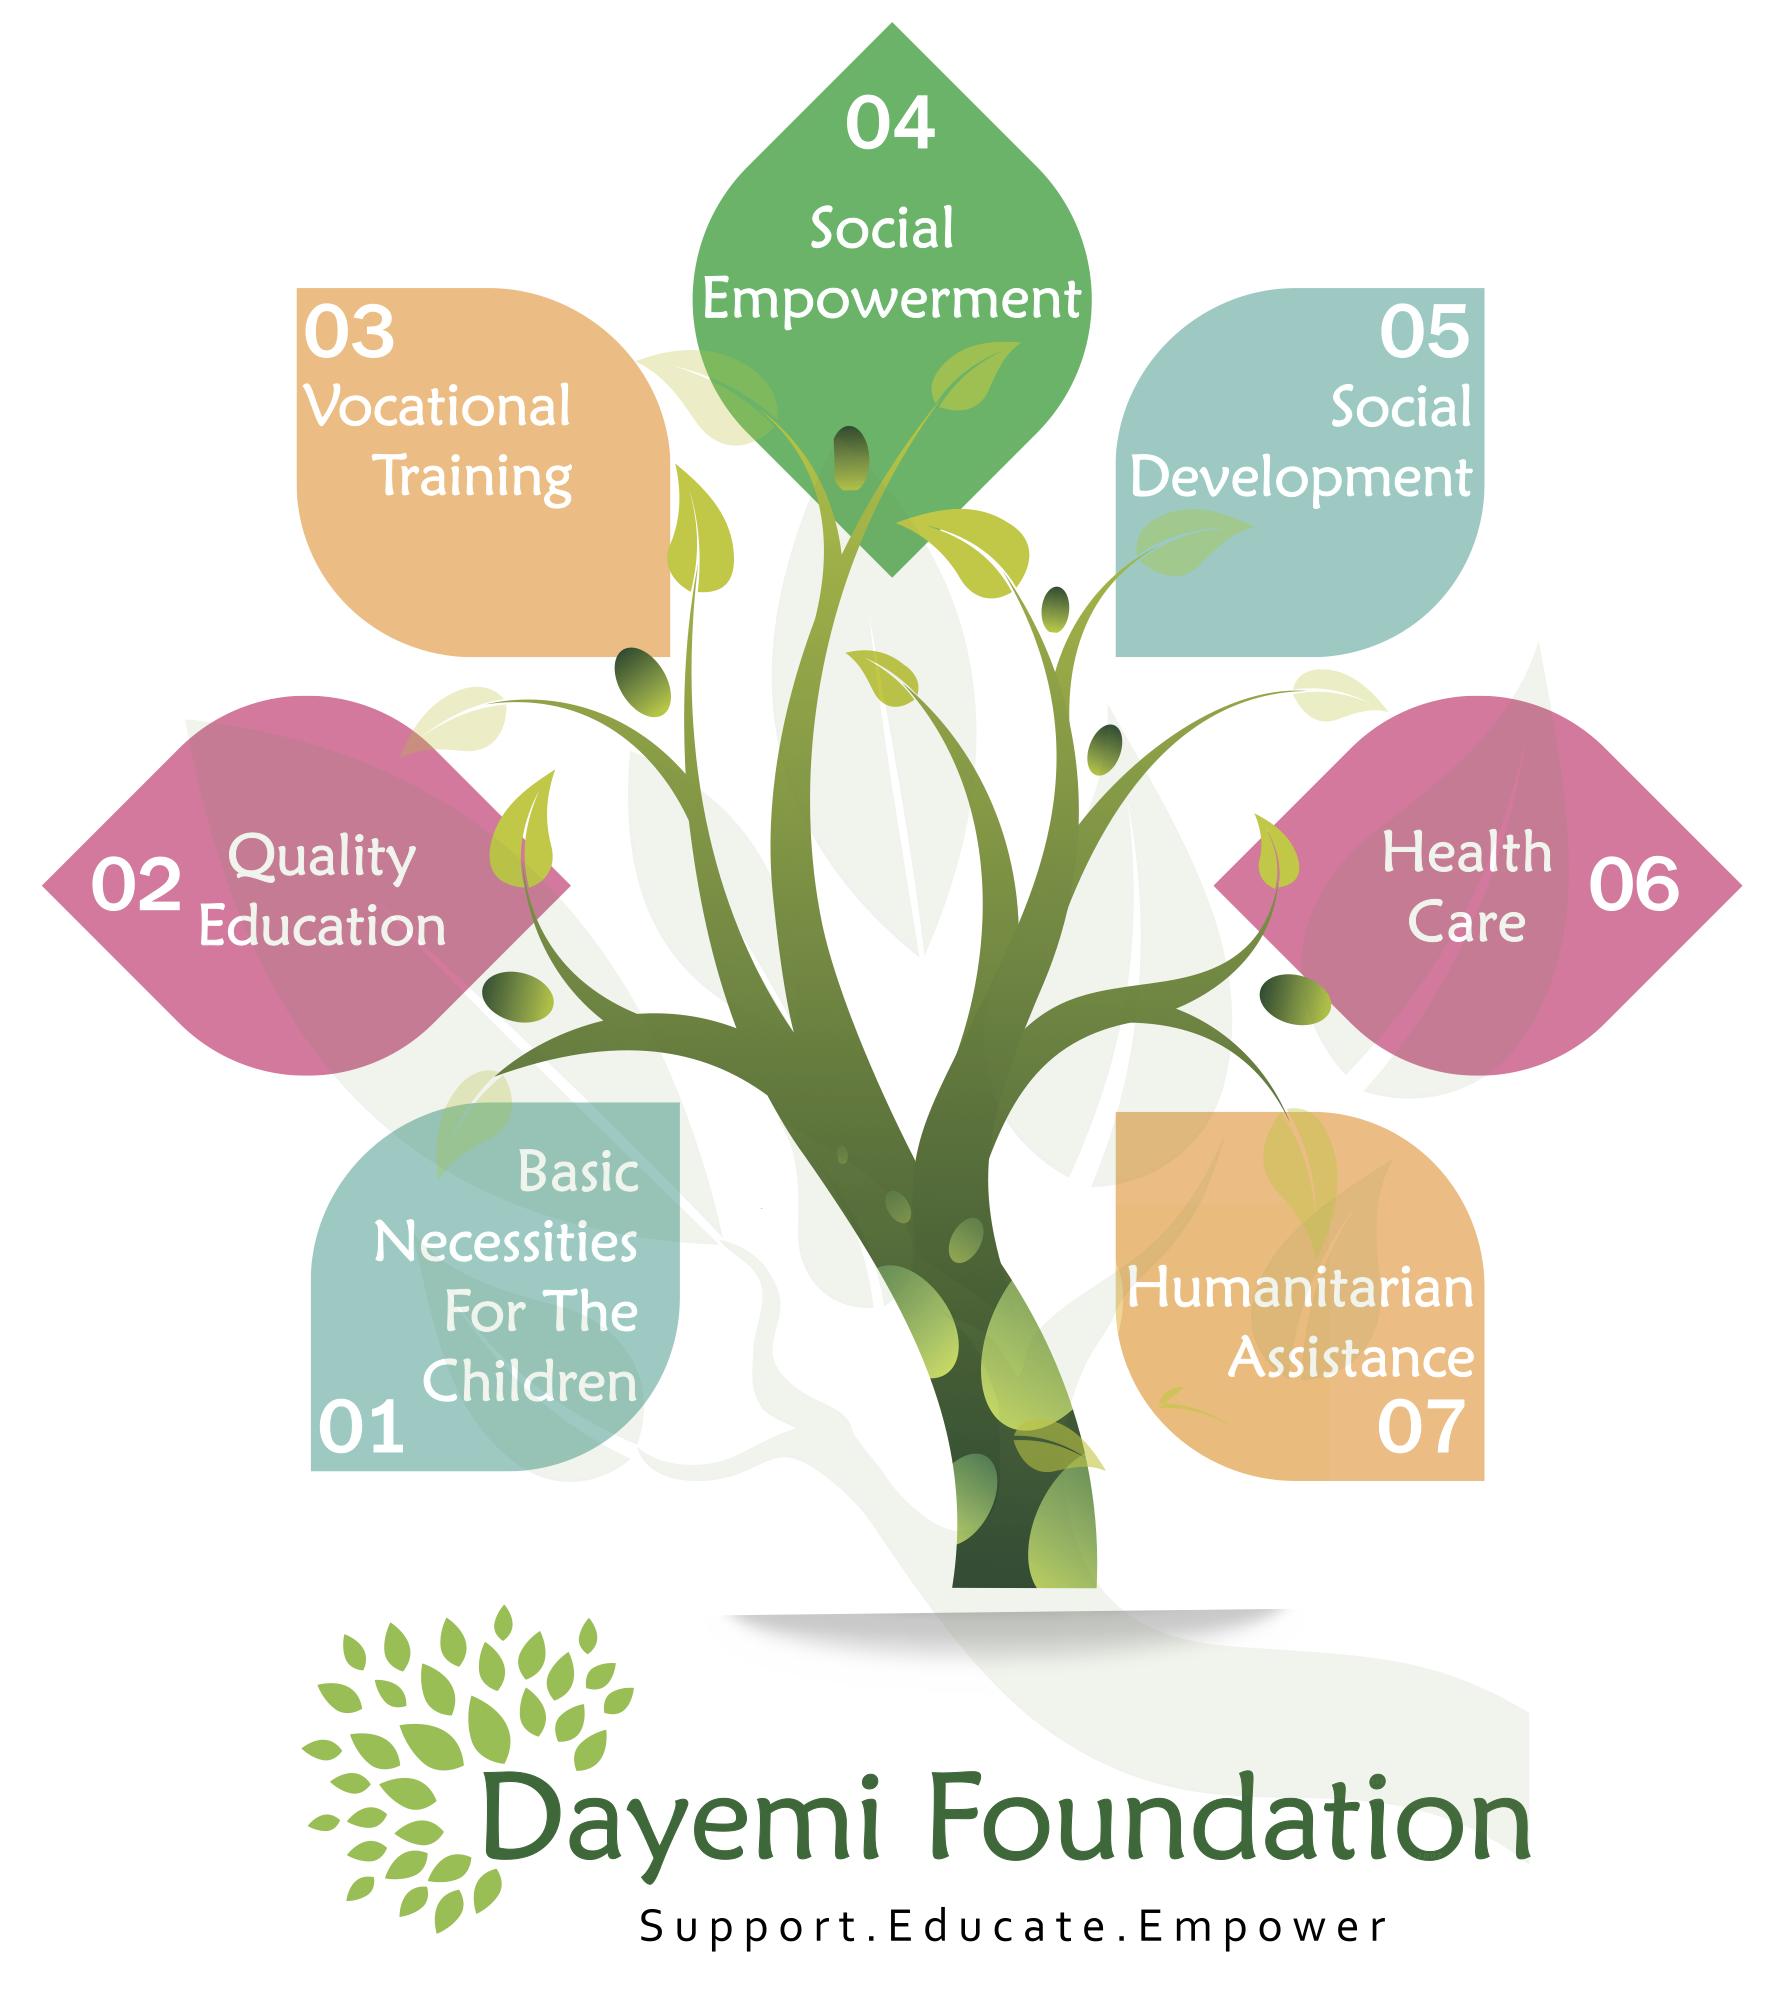 File:Dayemi Foundation Tree.png.